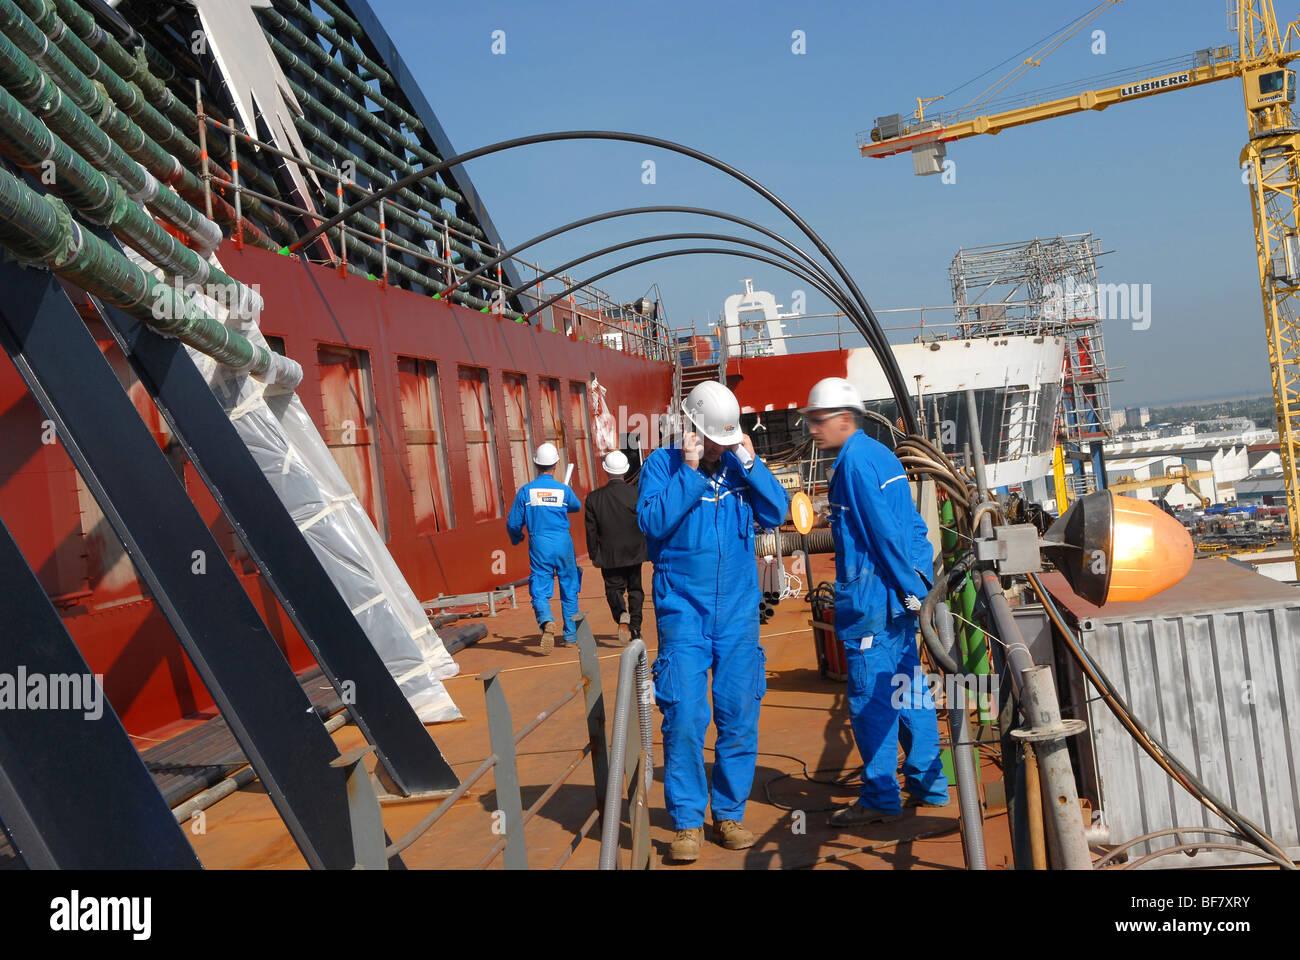 St-Nazaire (44) : 'Aker Yards' shipyards, construction of the steamship ' MSC Fantasia' (07/05/08) - Stock Image